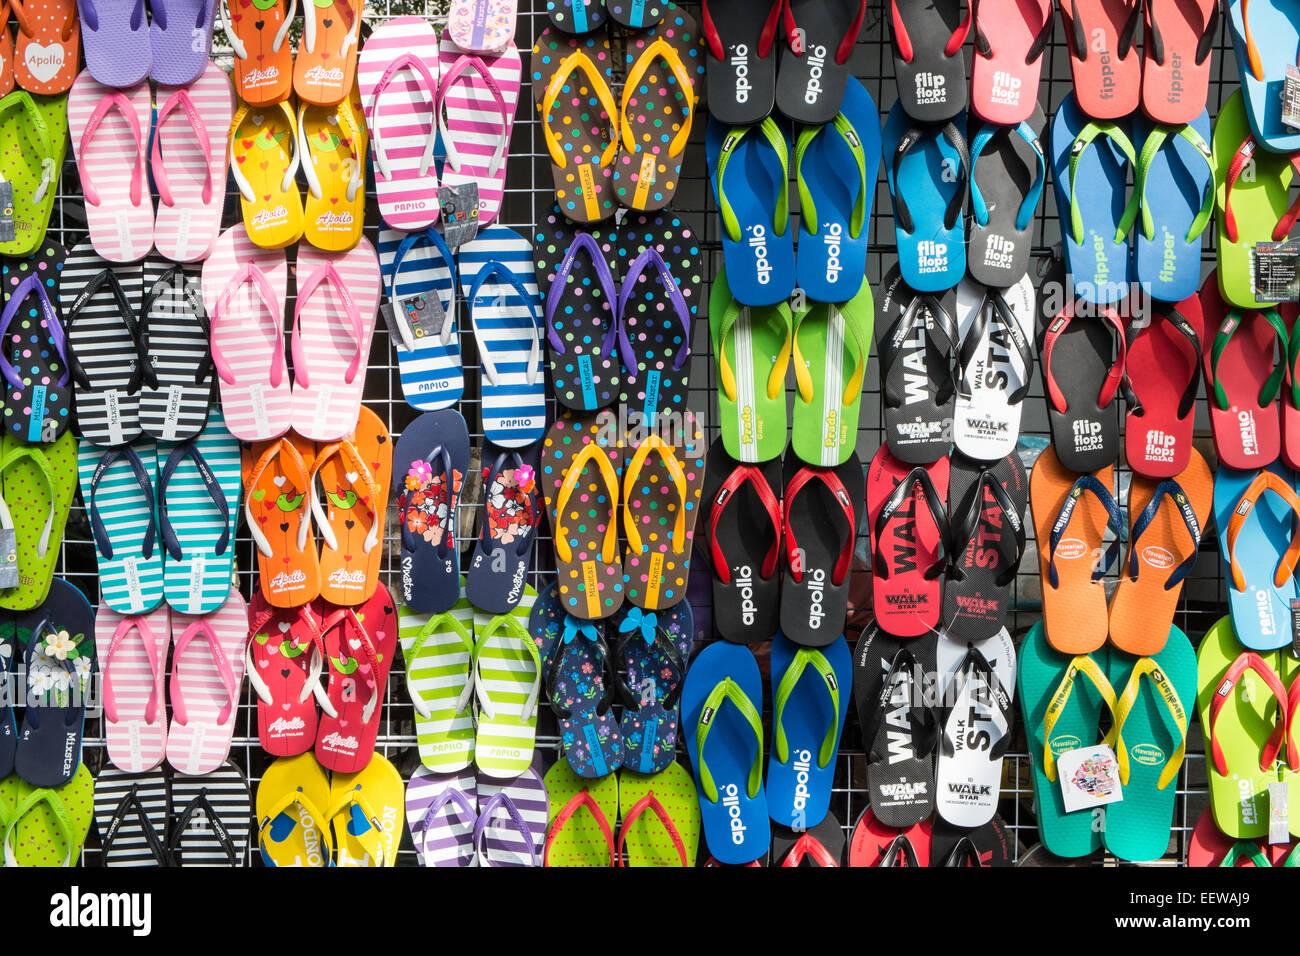 Weekend Shoes Tourist Shopping 0p8nwonkx Chatuchak Photosamp; rdCQtsh